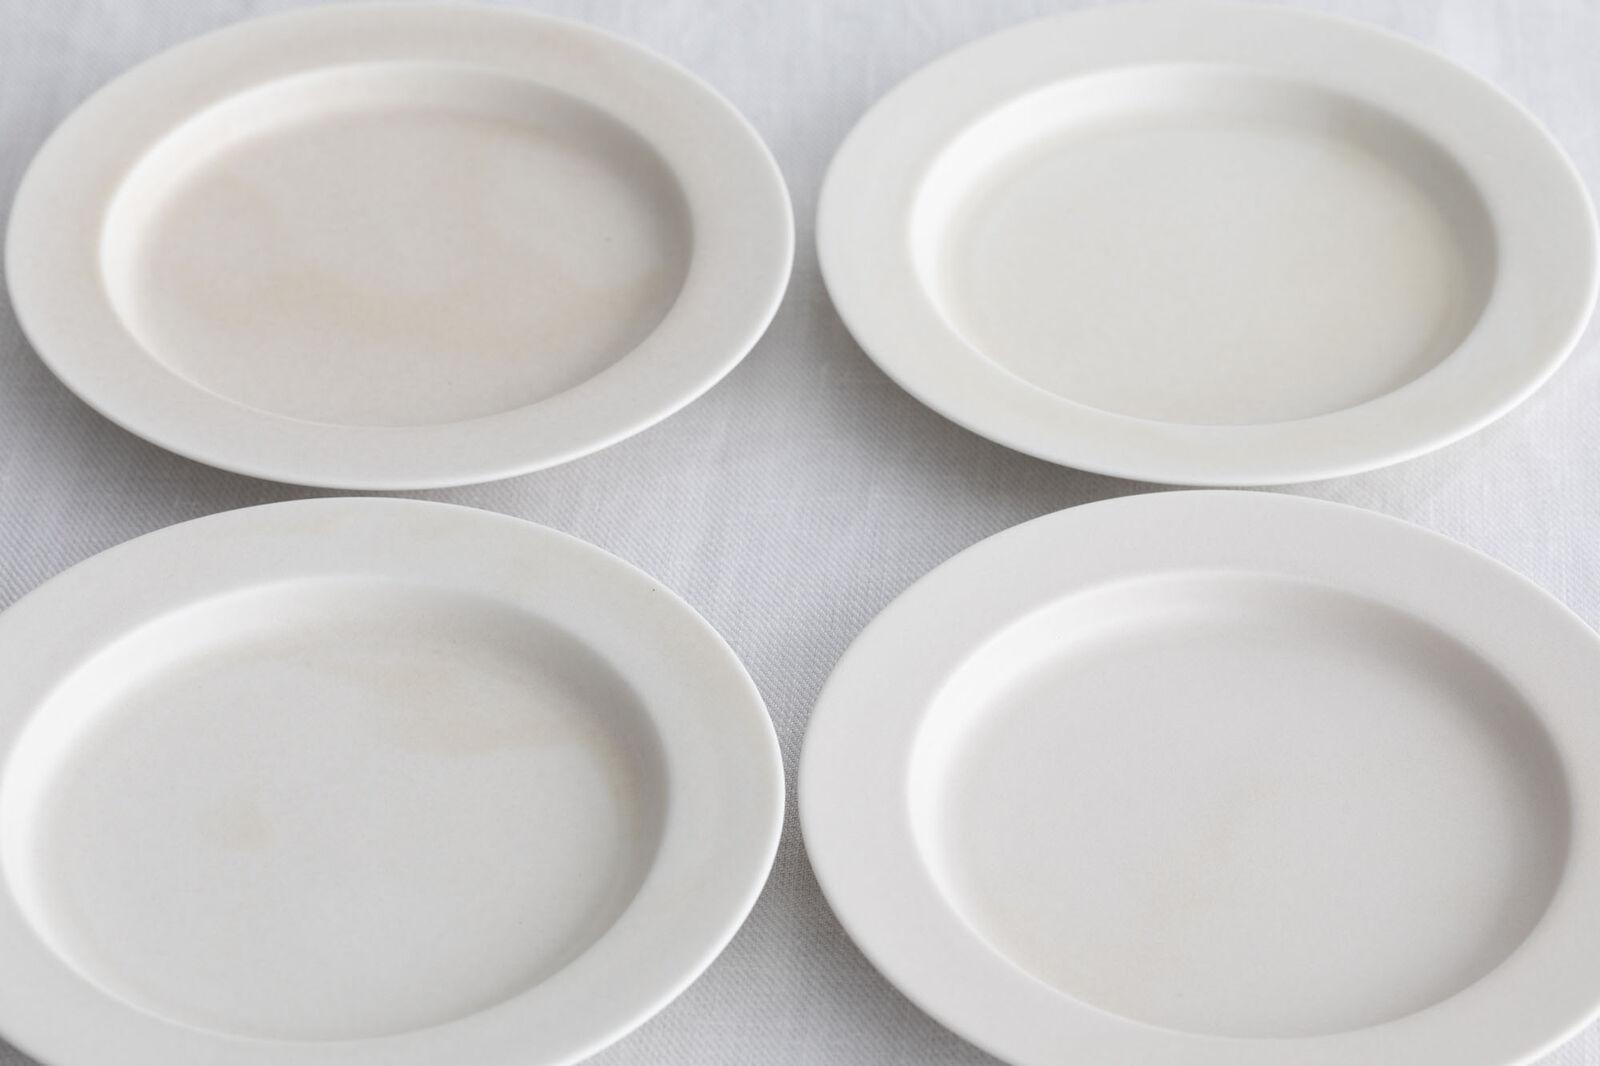 Yumiko Yumiko Yumiko iihoshi porcelain matin plate (plate L) 3 Farbes aeb648